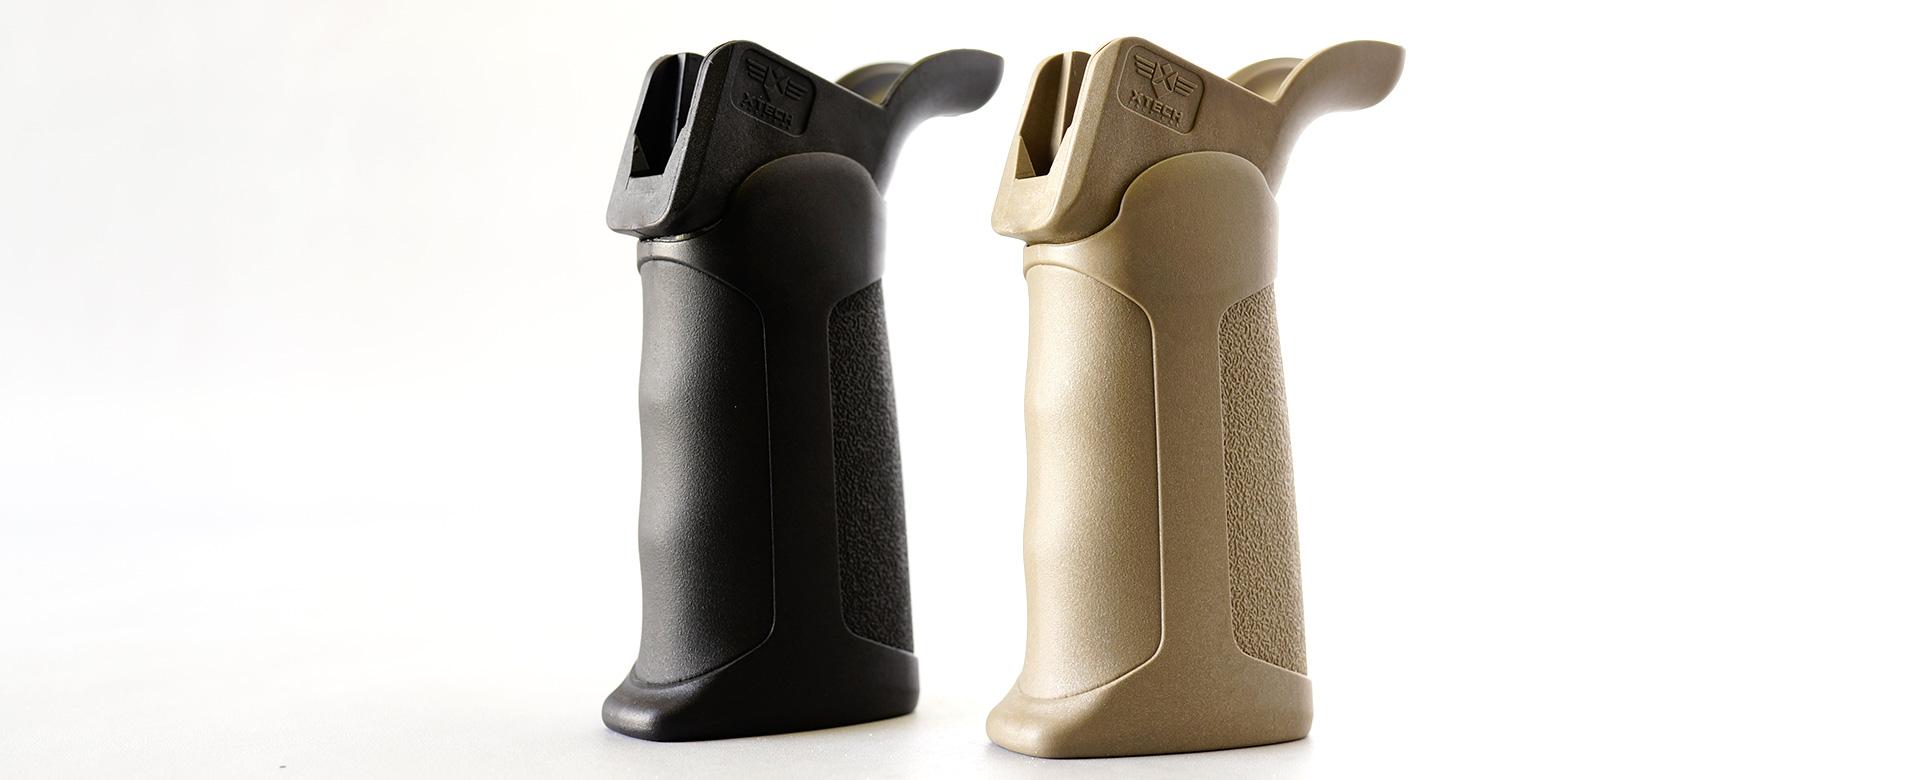 ATG AR15 Product Slider FDE Black